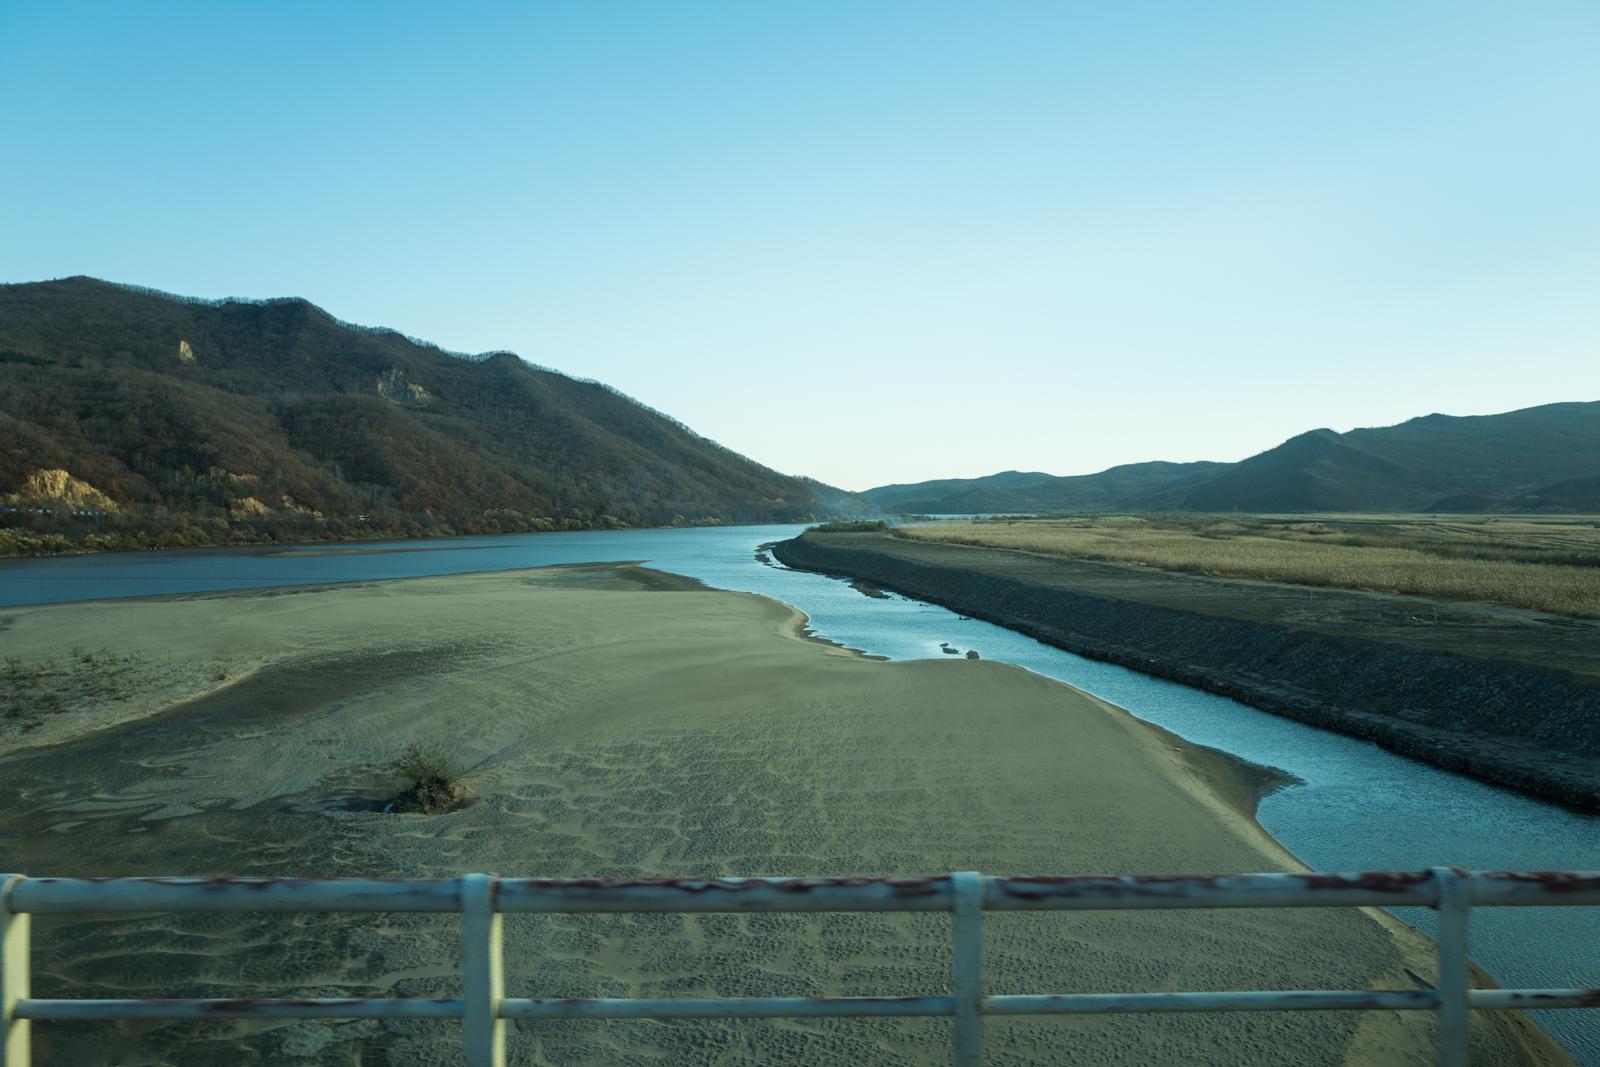 Last photo taken as we crossed the Yalu River into North Korea.